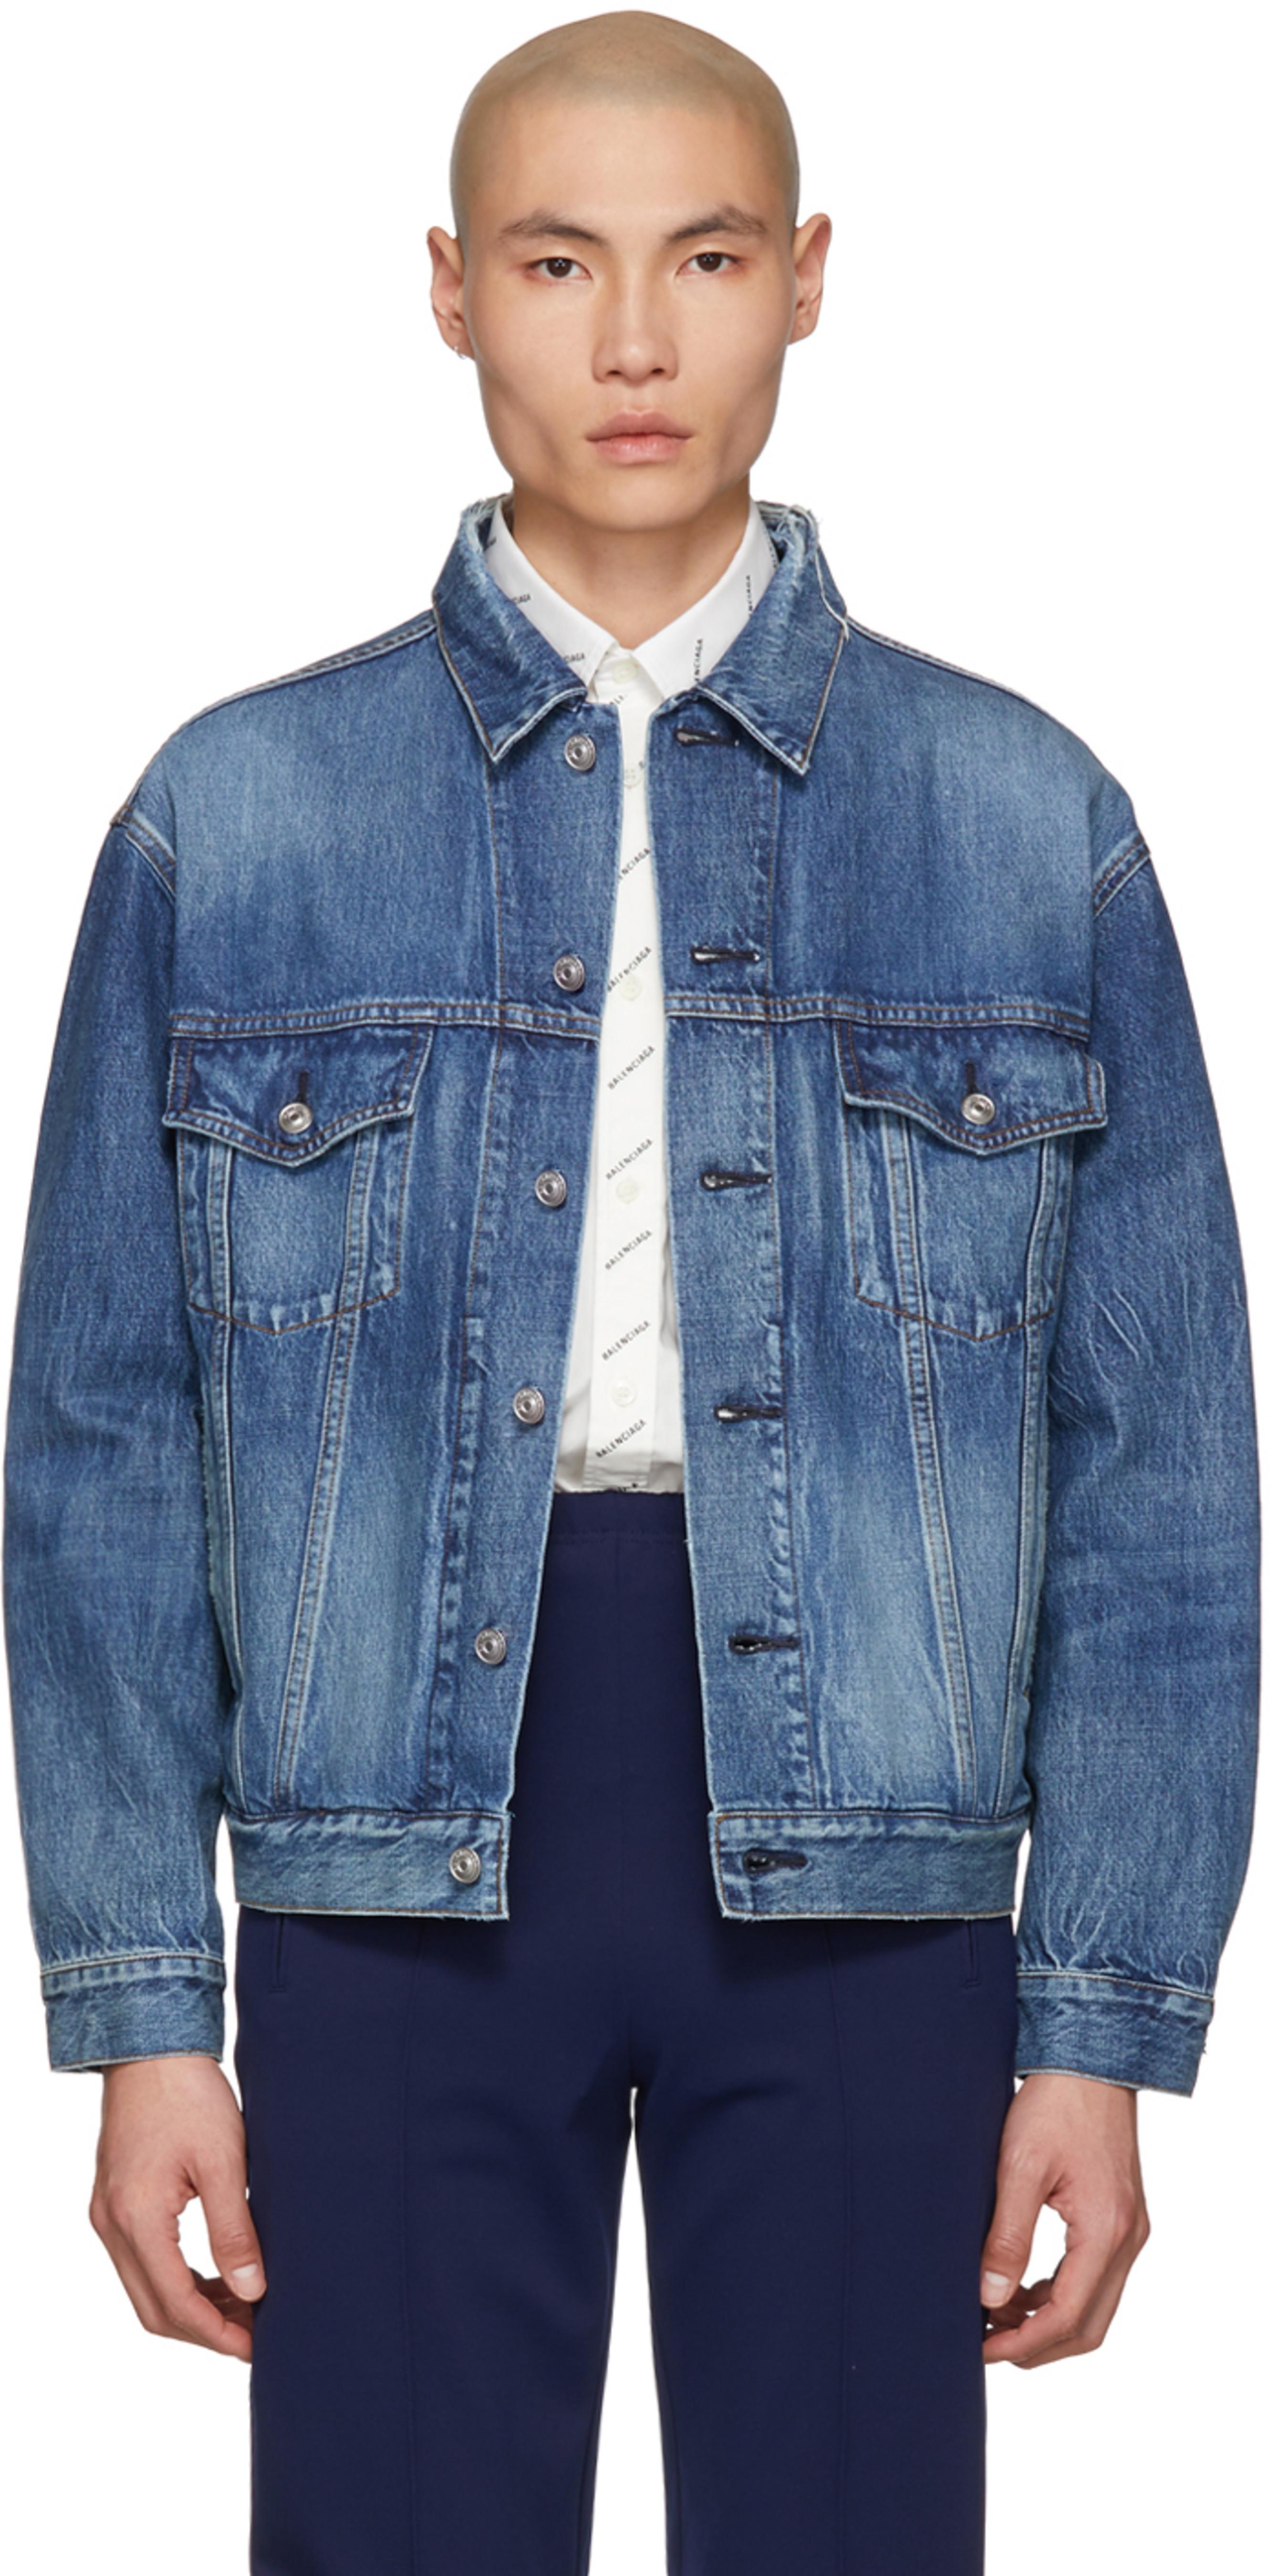 premium selection 0a656 48f7a Blue Denim Logo Jacket